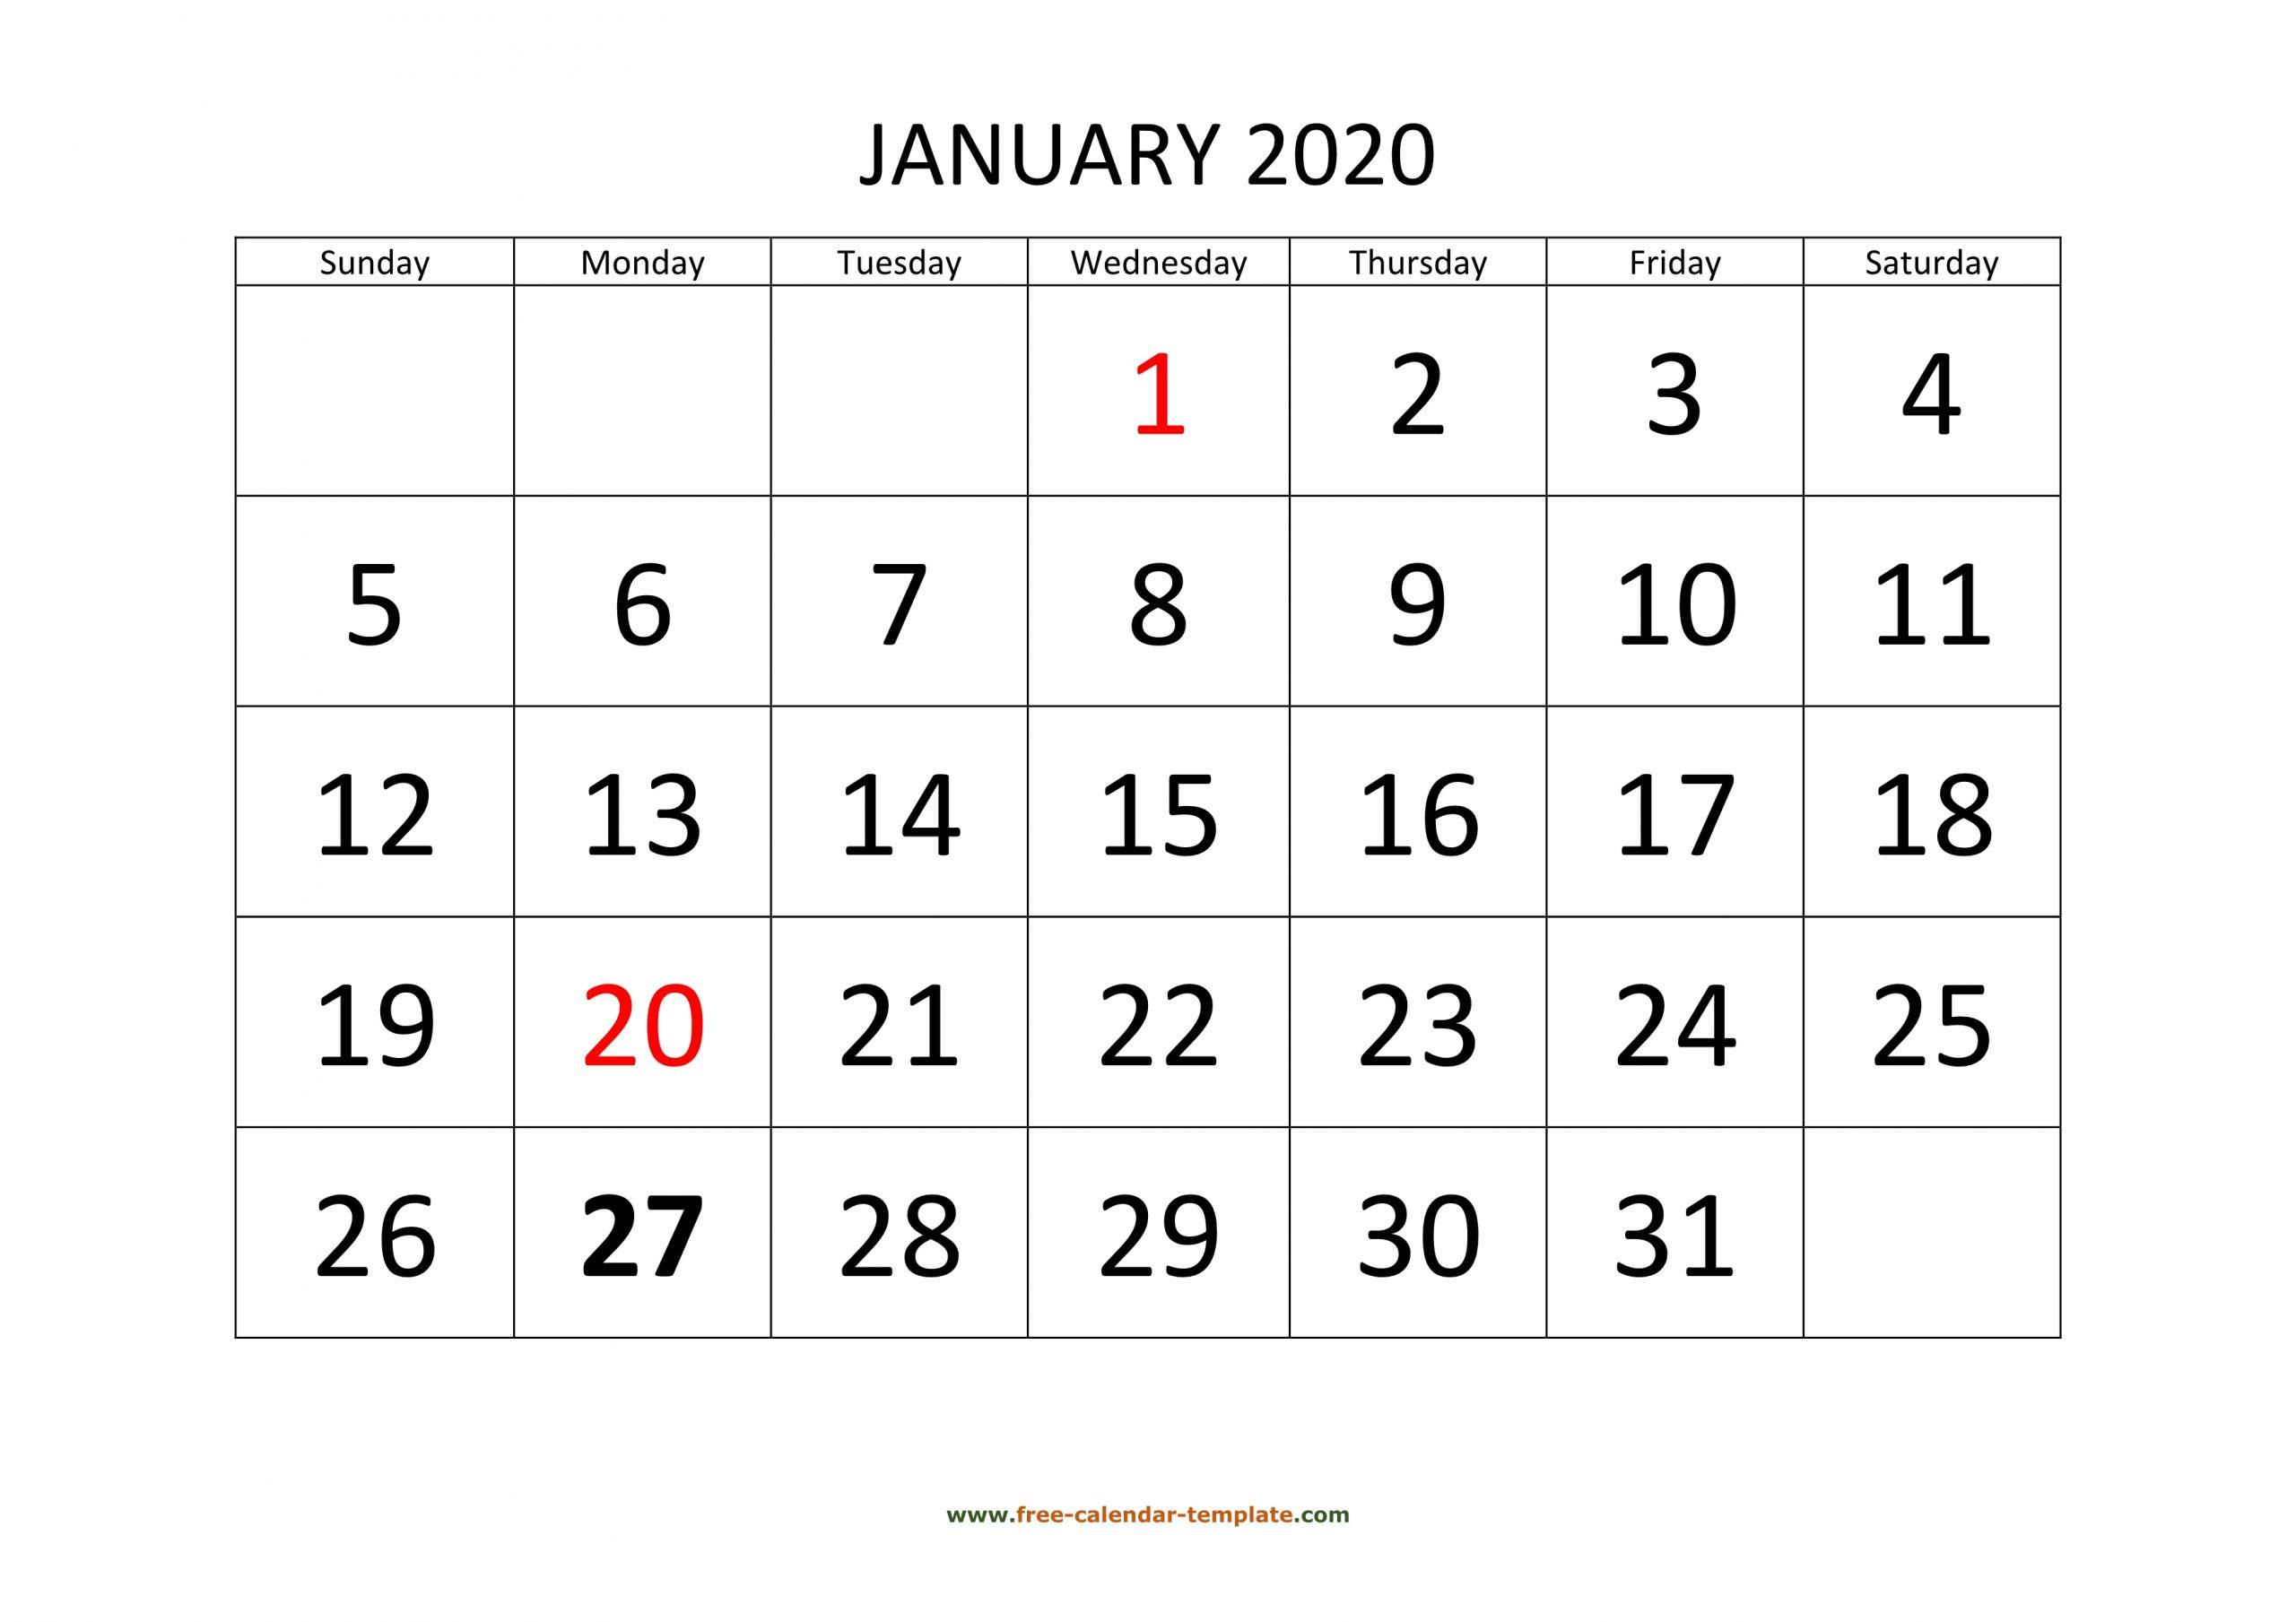 January 2020 Calendar Designed With Large Font (Horizontal